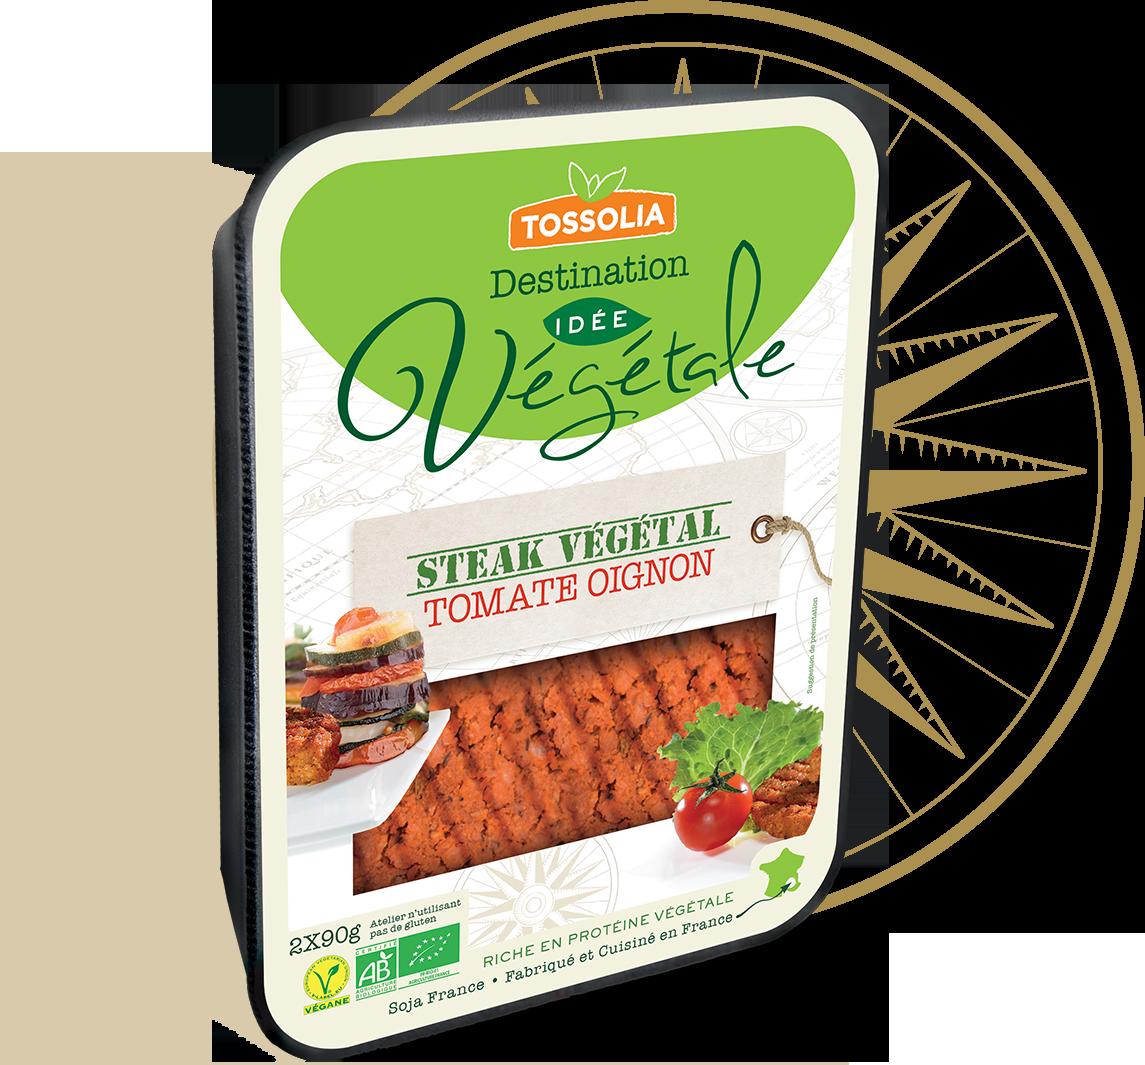 Steak végétal tomate oignon